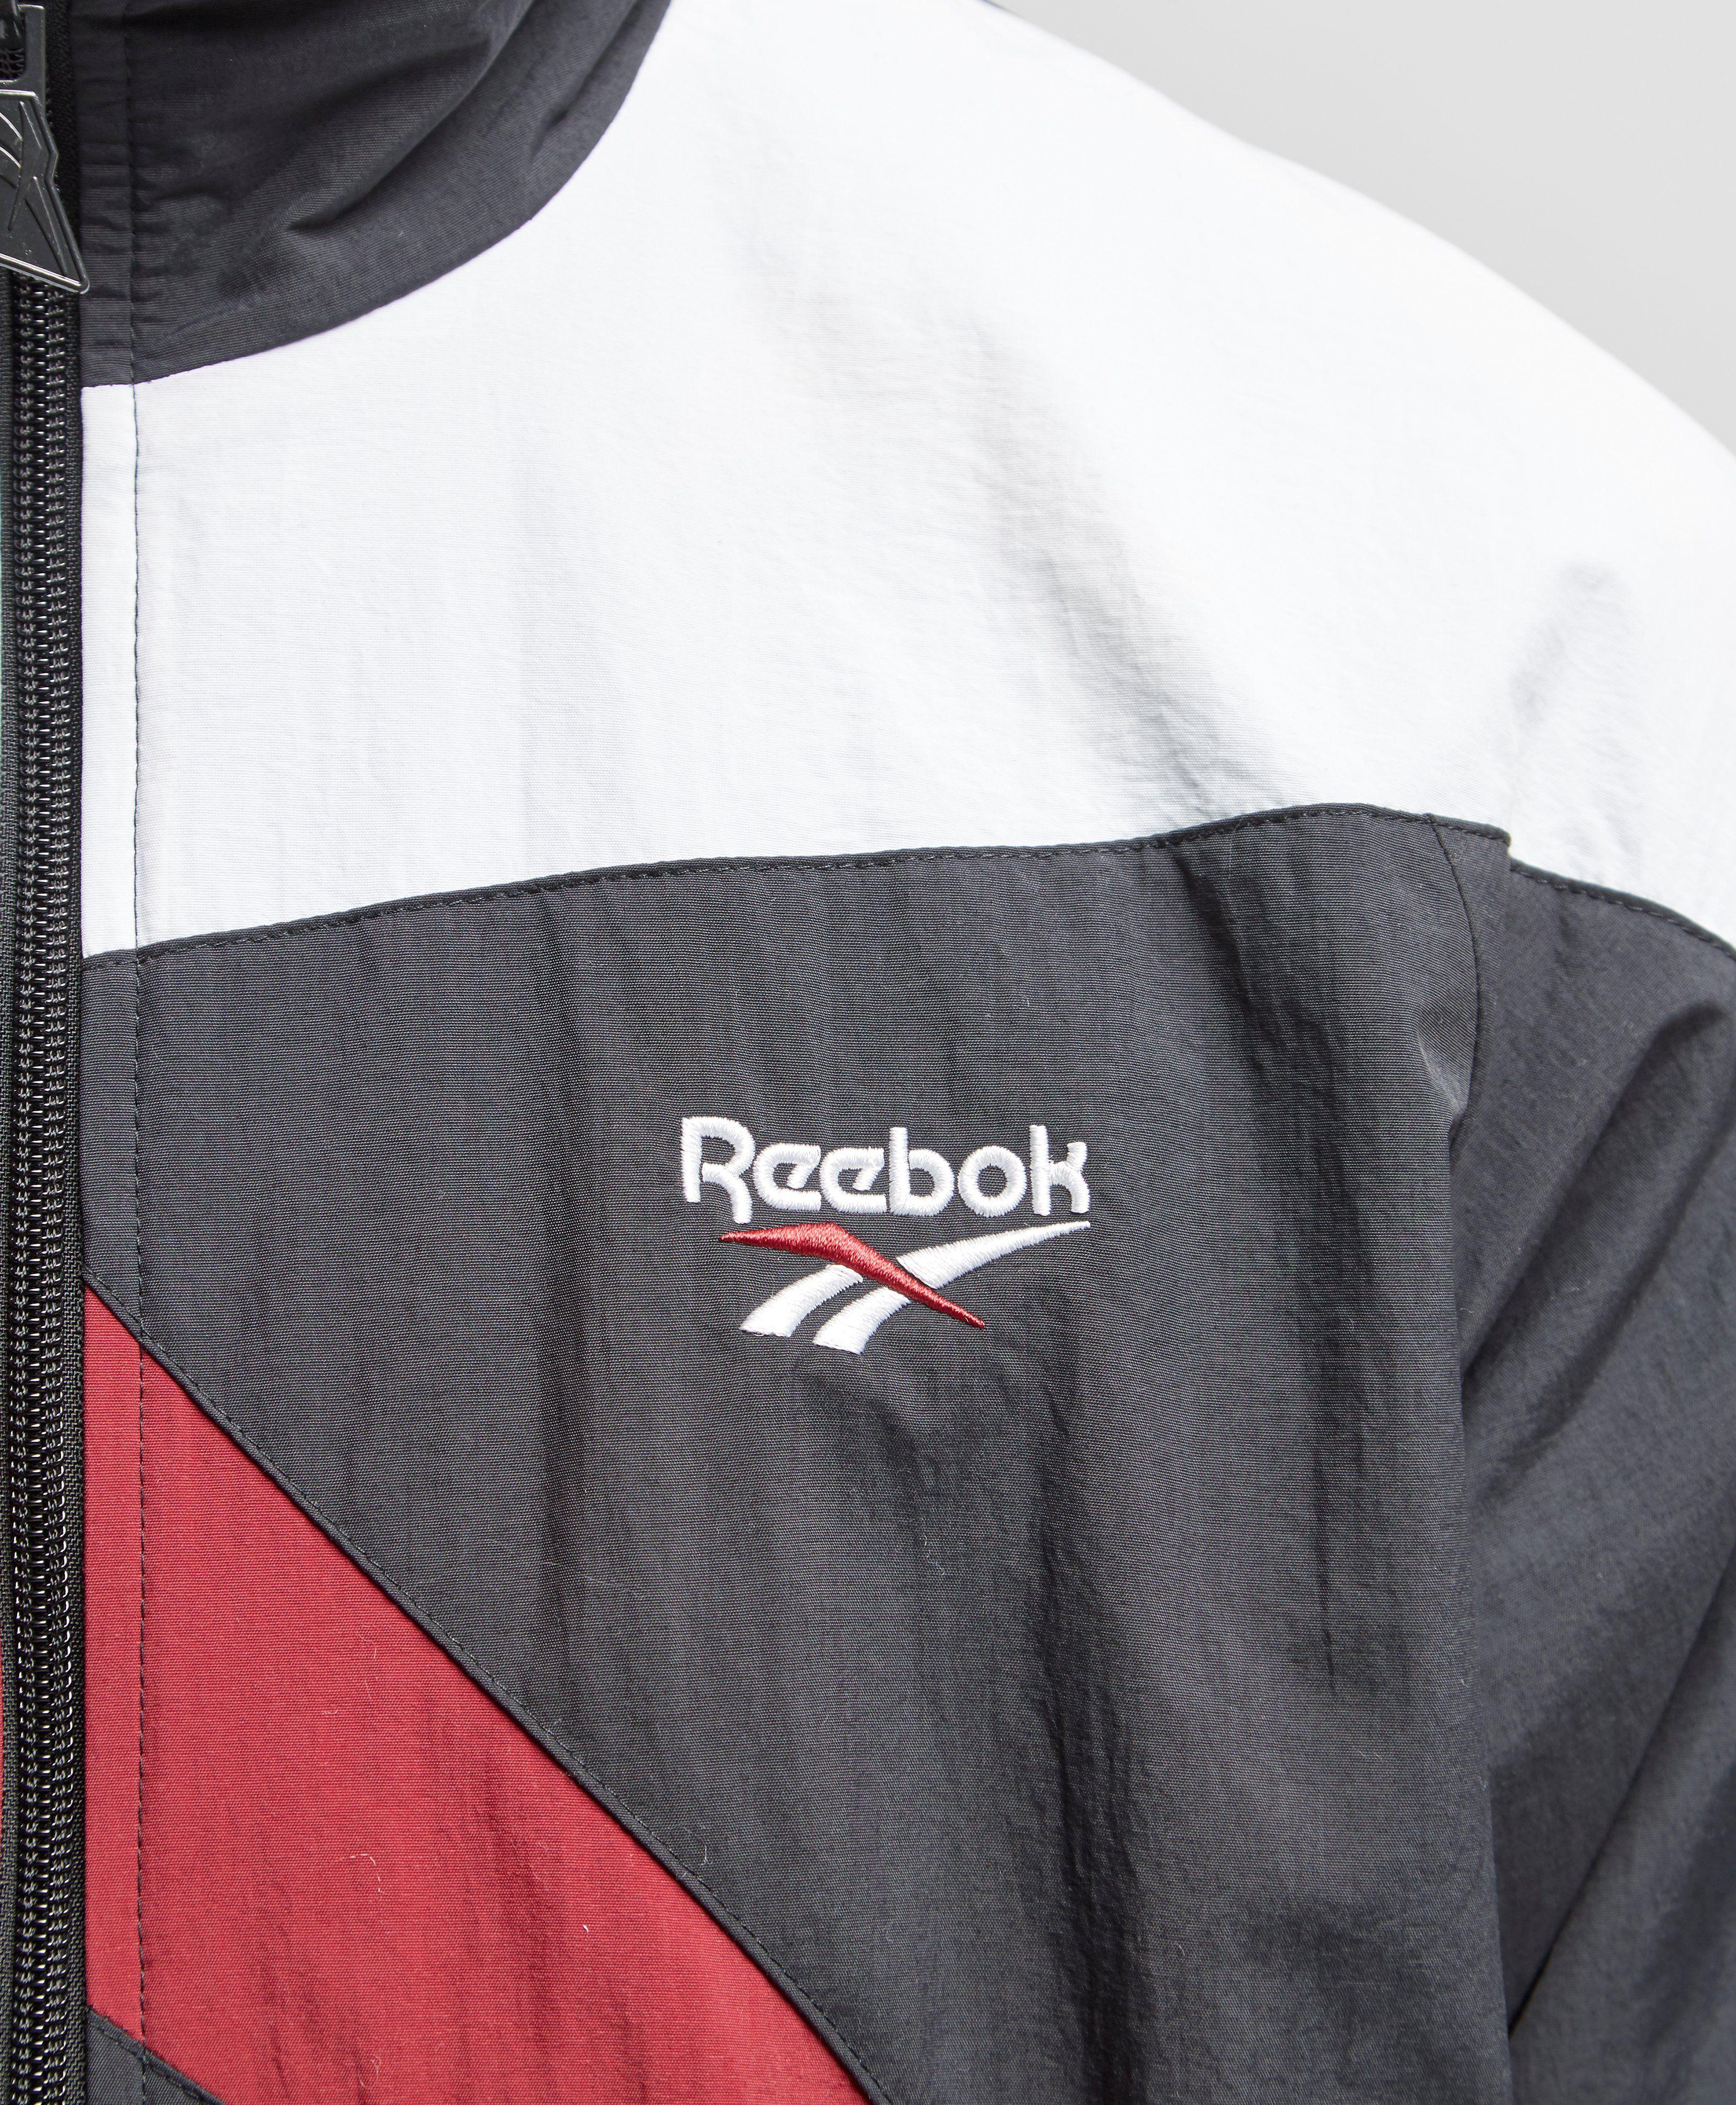 Reebok Track Top Vector Collection